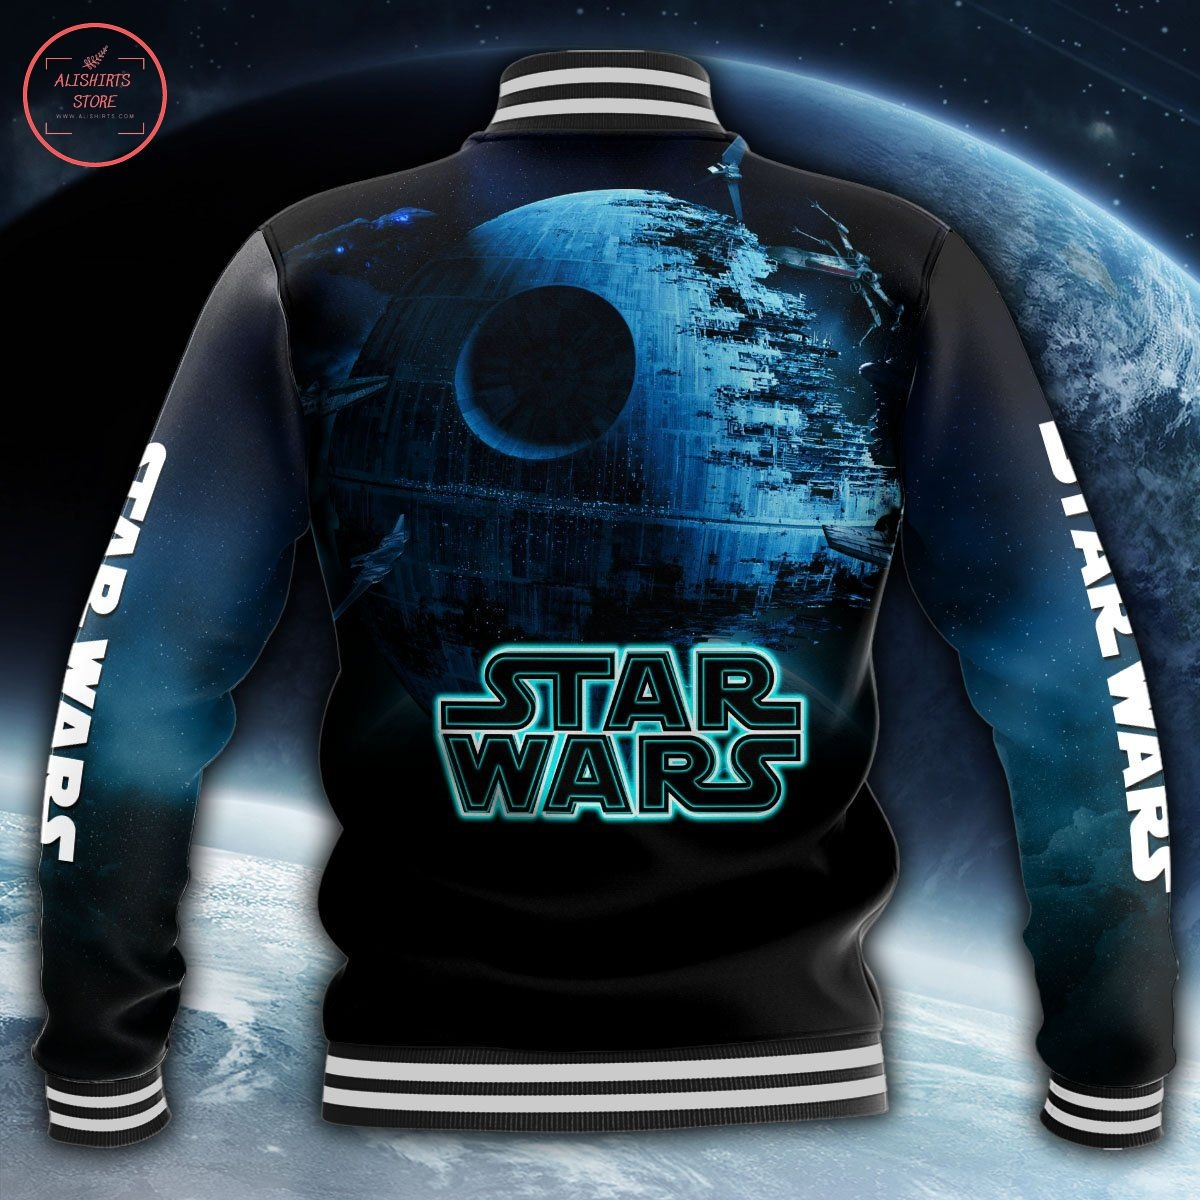 Star Wars All Over Print Letterman Jacket